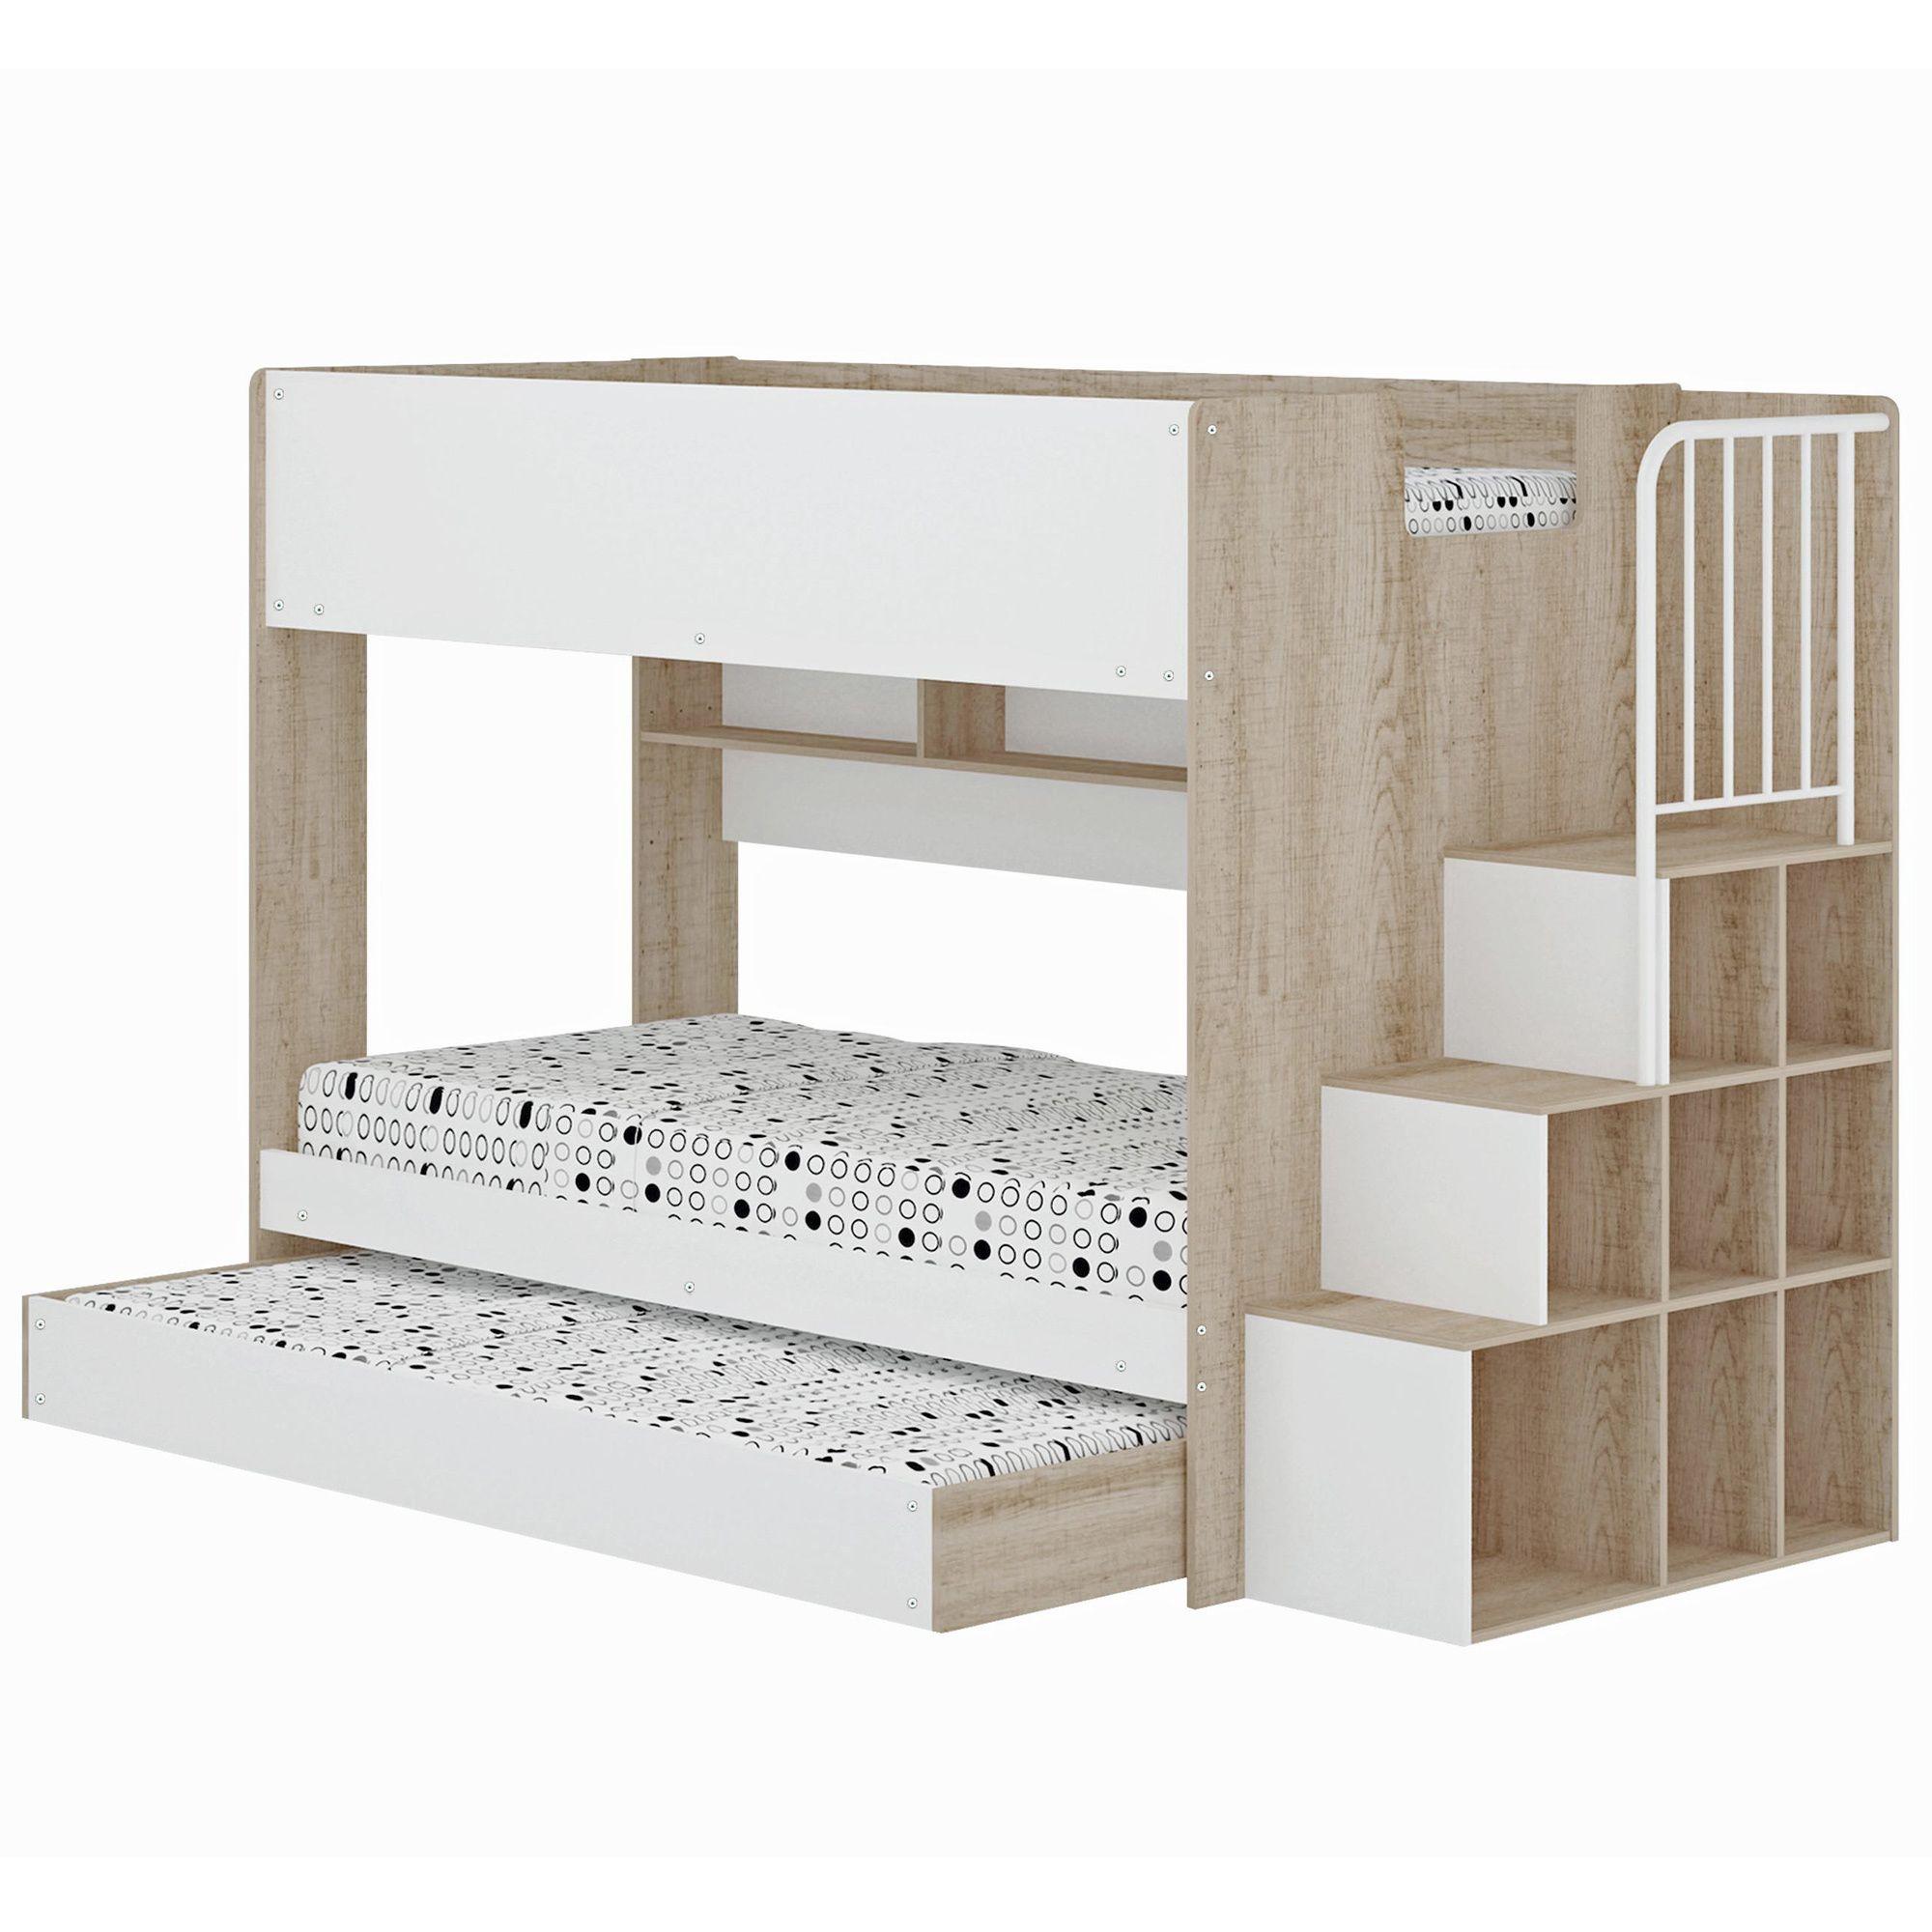 Loft bed with desk jordan's furniture  Cruz Trio Single Bunk Bed u Shelves  Bunk bed shelf Single bunk